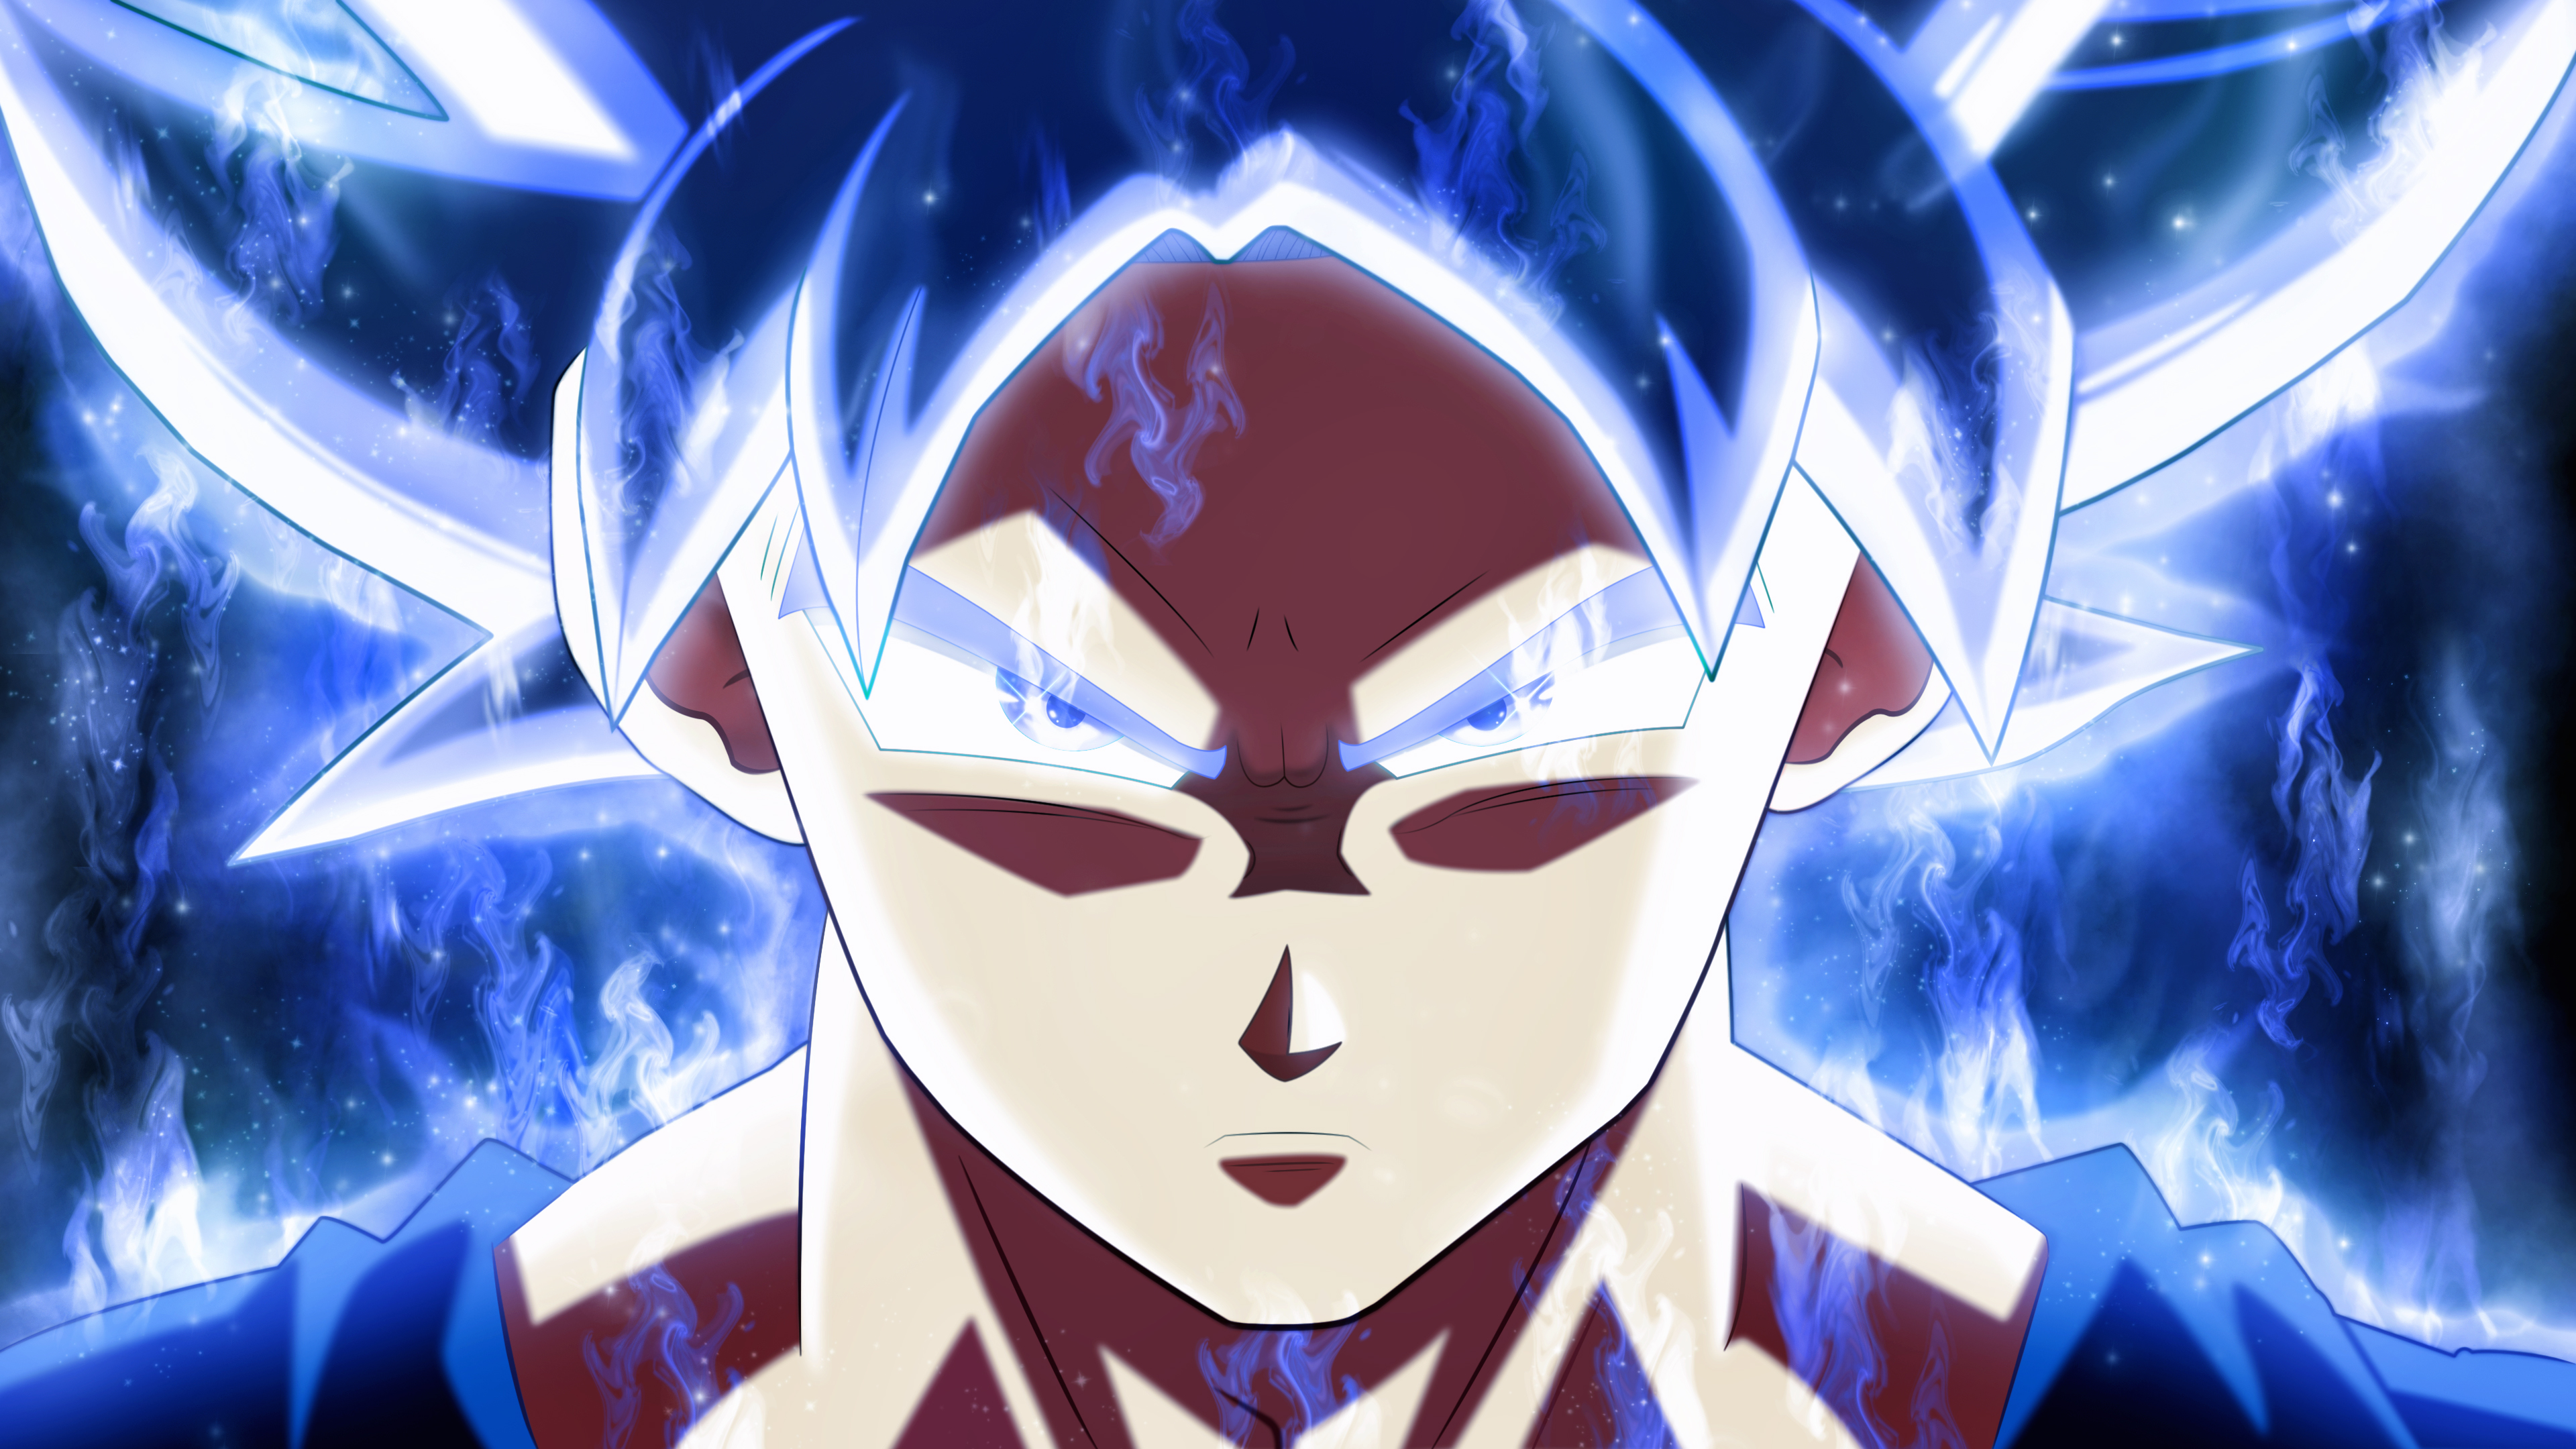 Dragon ball super 8k, hd anime, 4k fondos de pantalla, imágenes, fondos. Son Goku Dragon Ball Super 4k, HD Anime, 4k Wallpapers ...